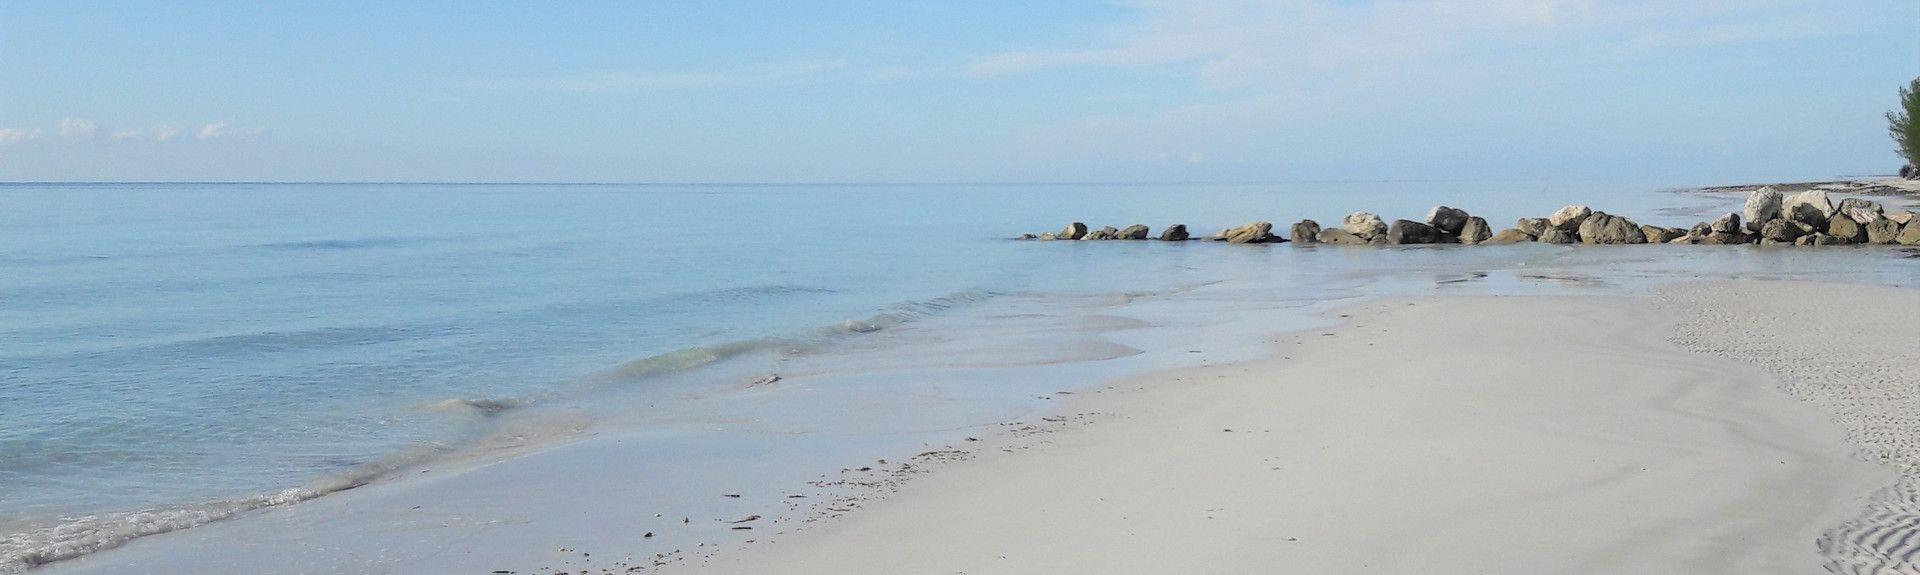 East Grand Bahama, Bahamas